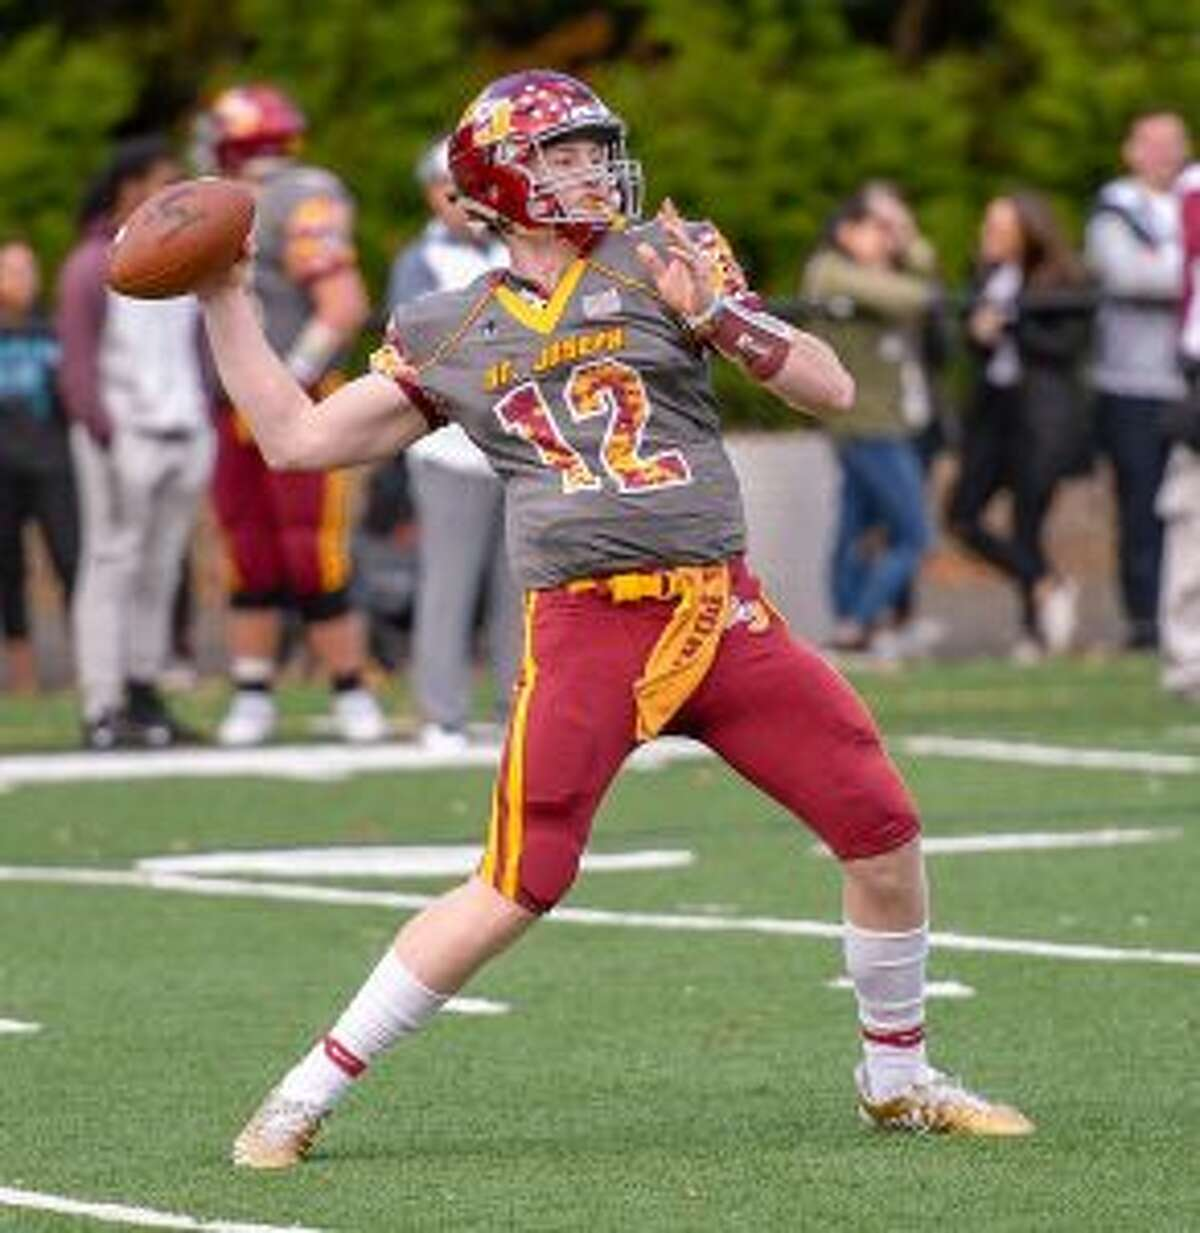 David Summers threw five touchdowns passes for St. Joseph. - David G. Whitham photos